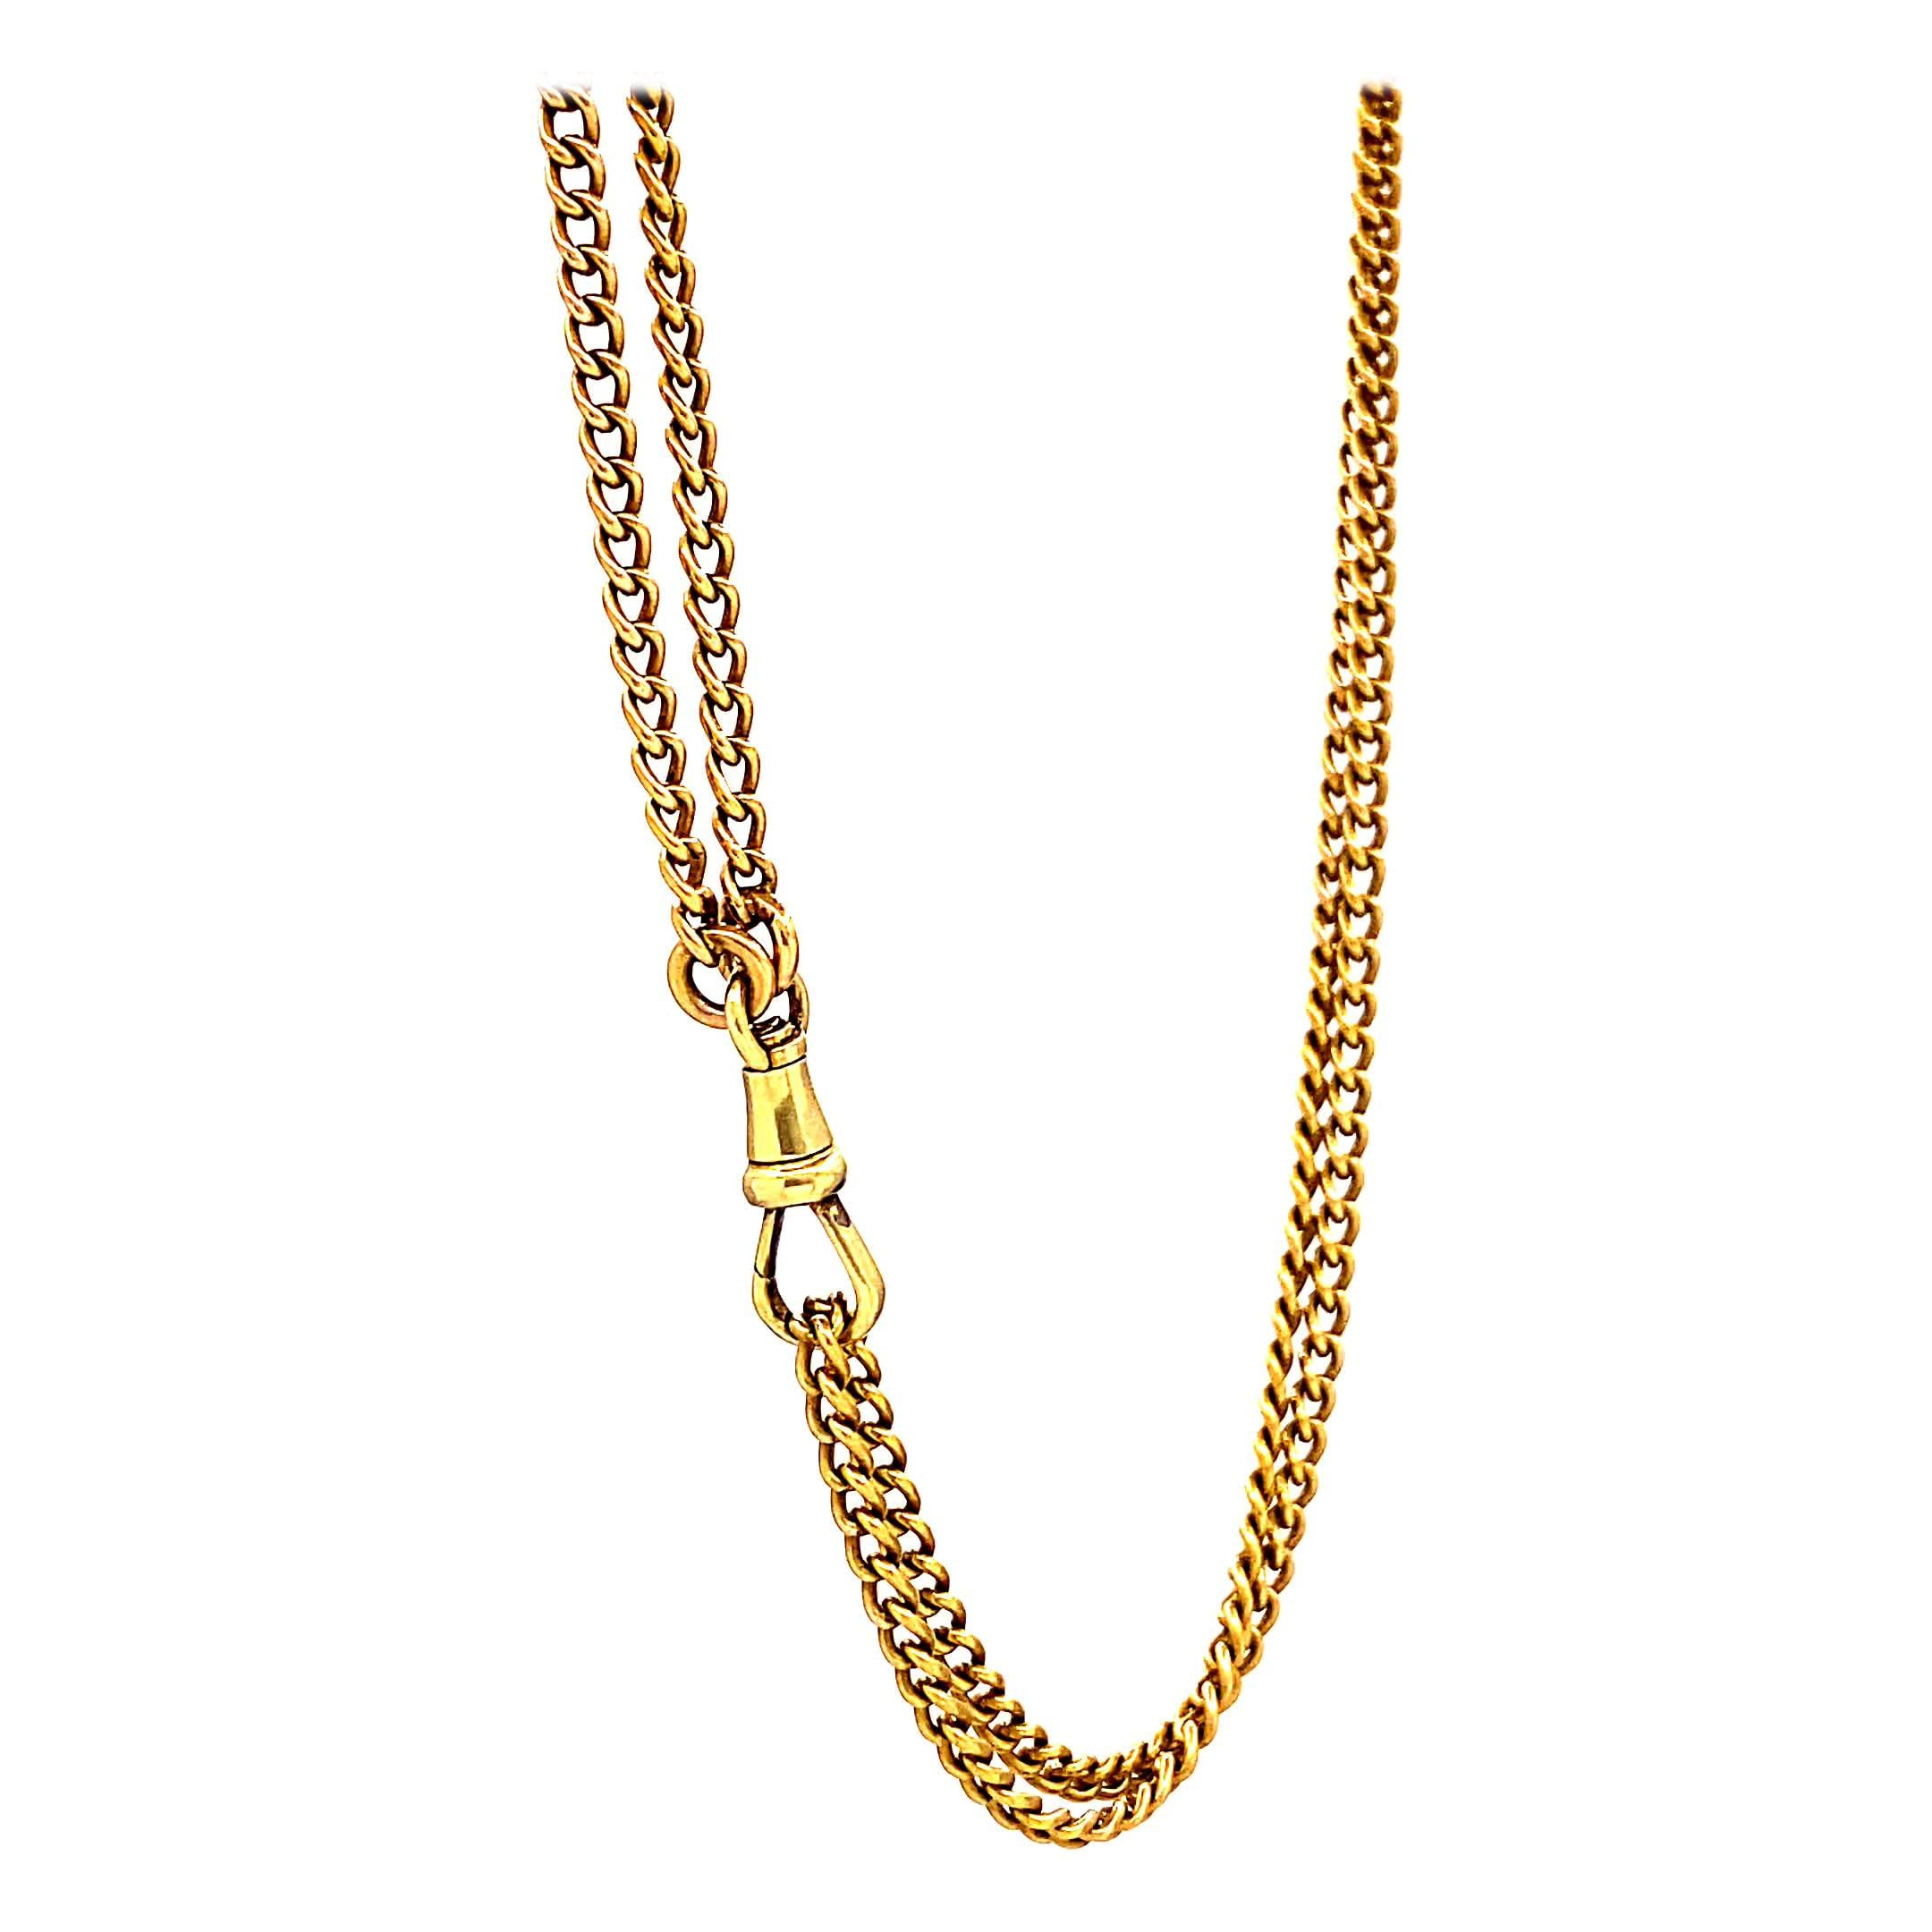 Antique French 18 Karat Gold Long Guard Chain